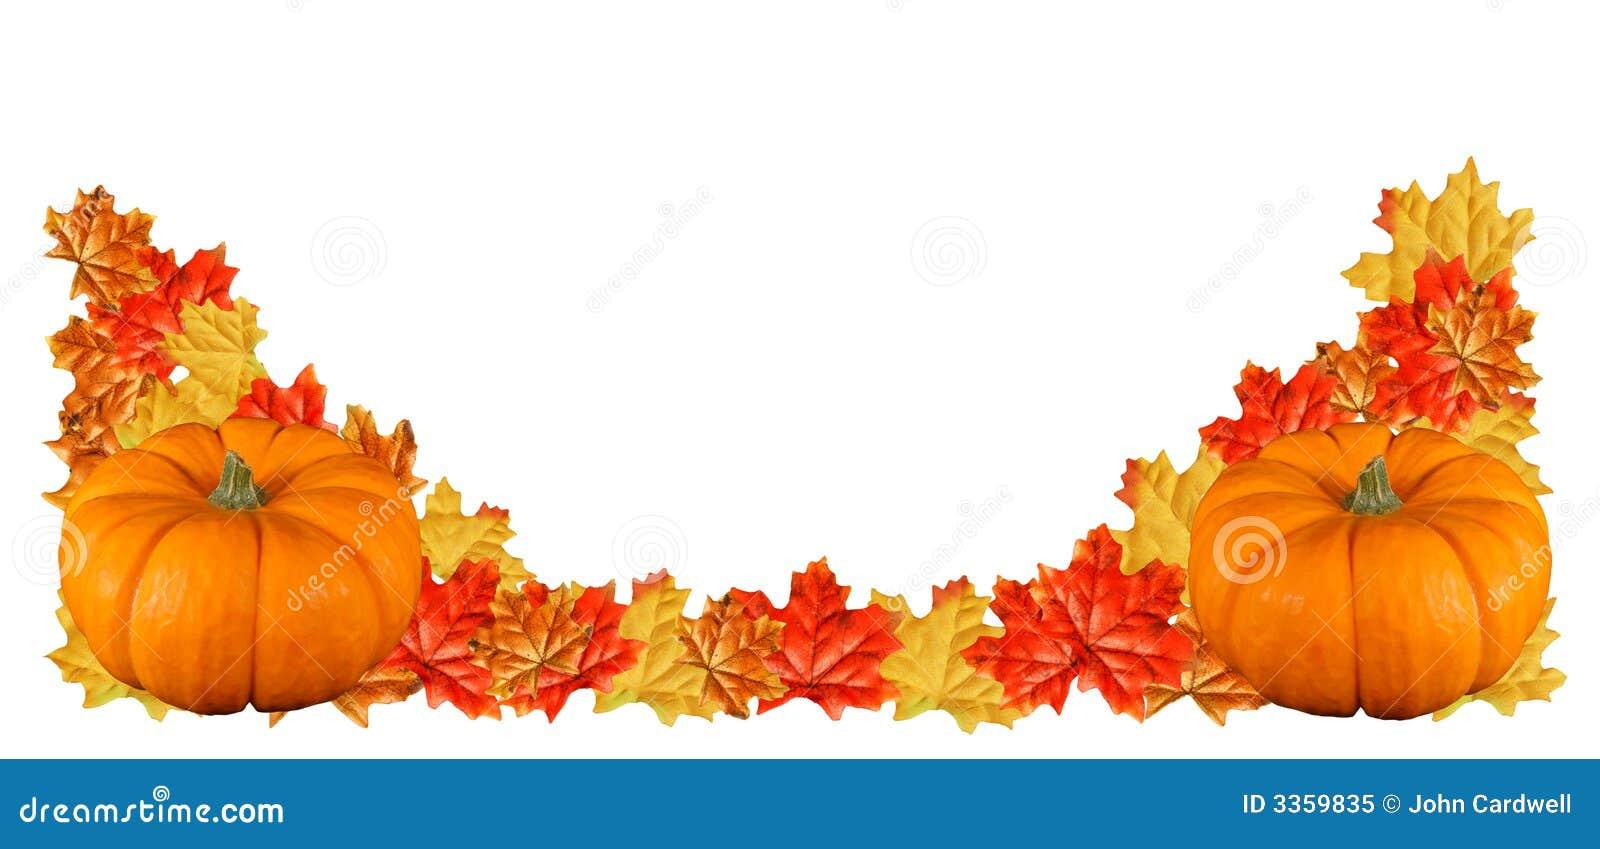 Two Pumpkin Border Royalty Free Stock Photo Image 3359835